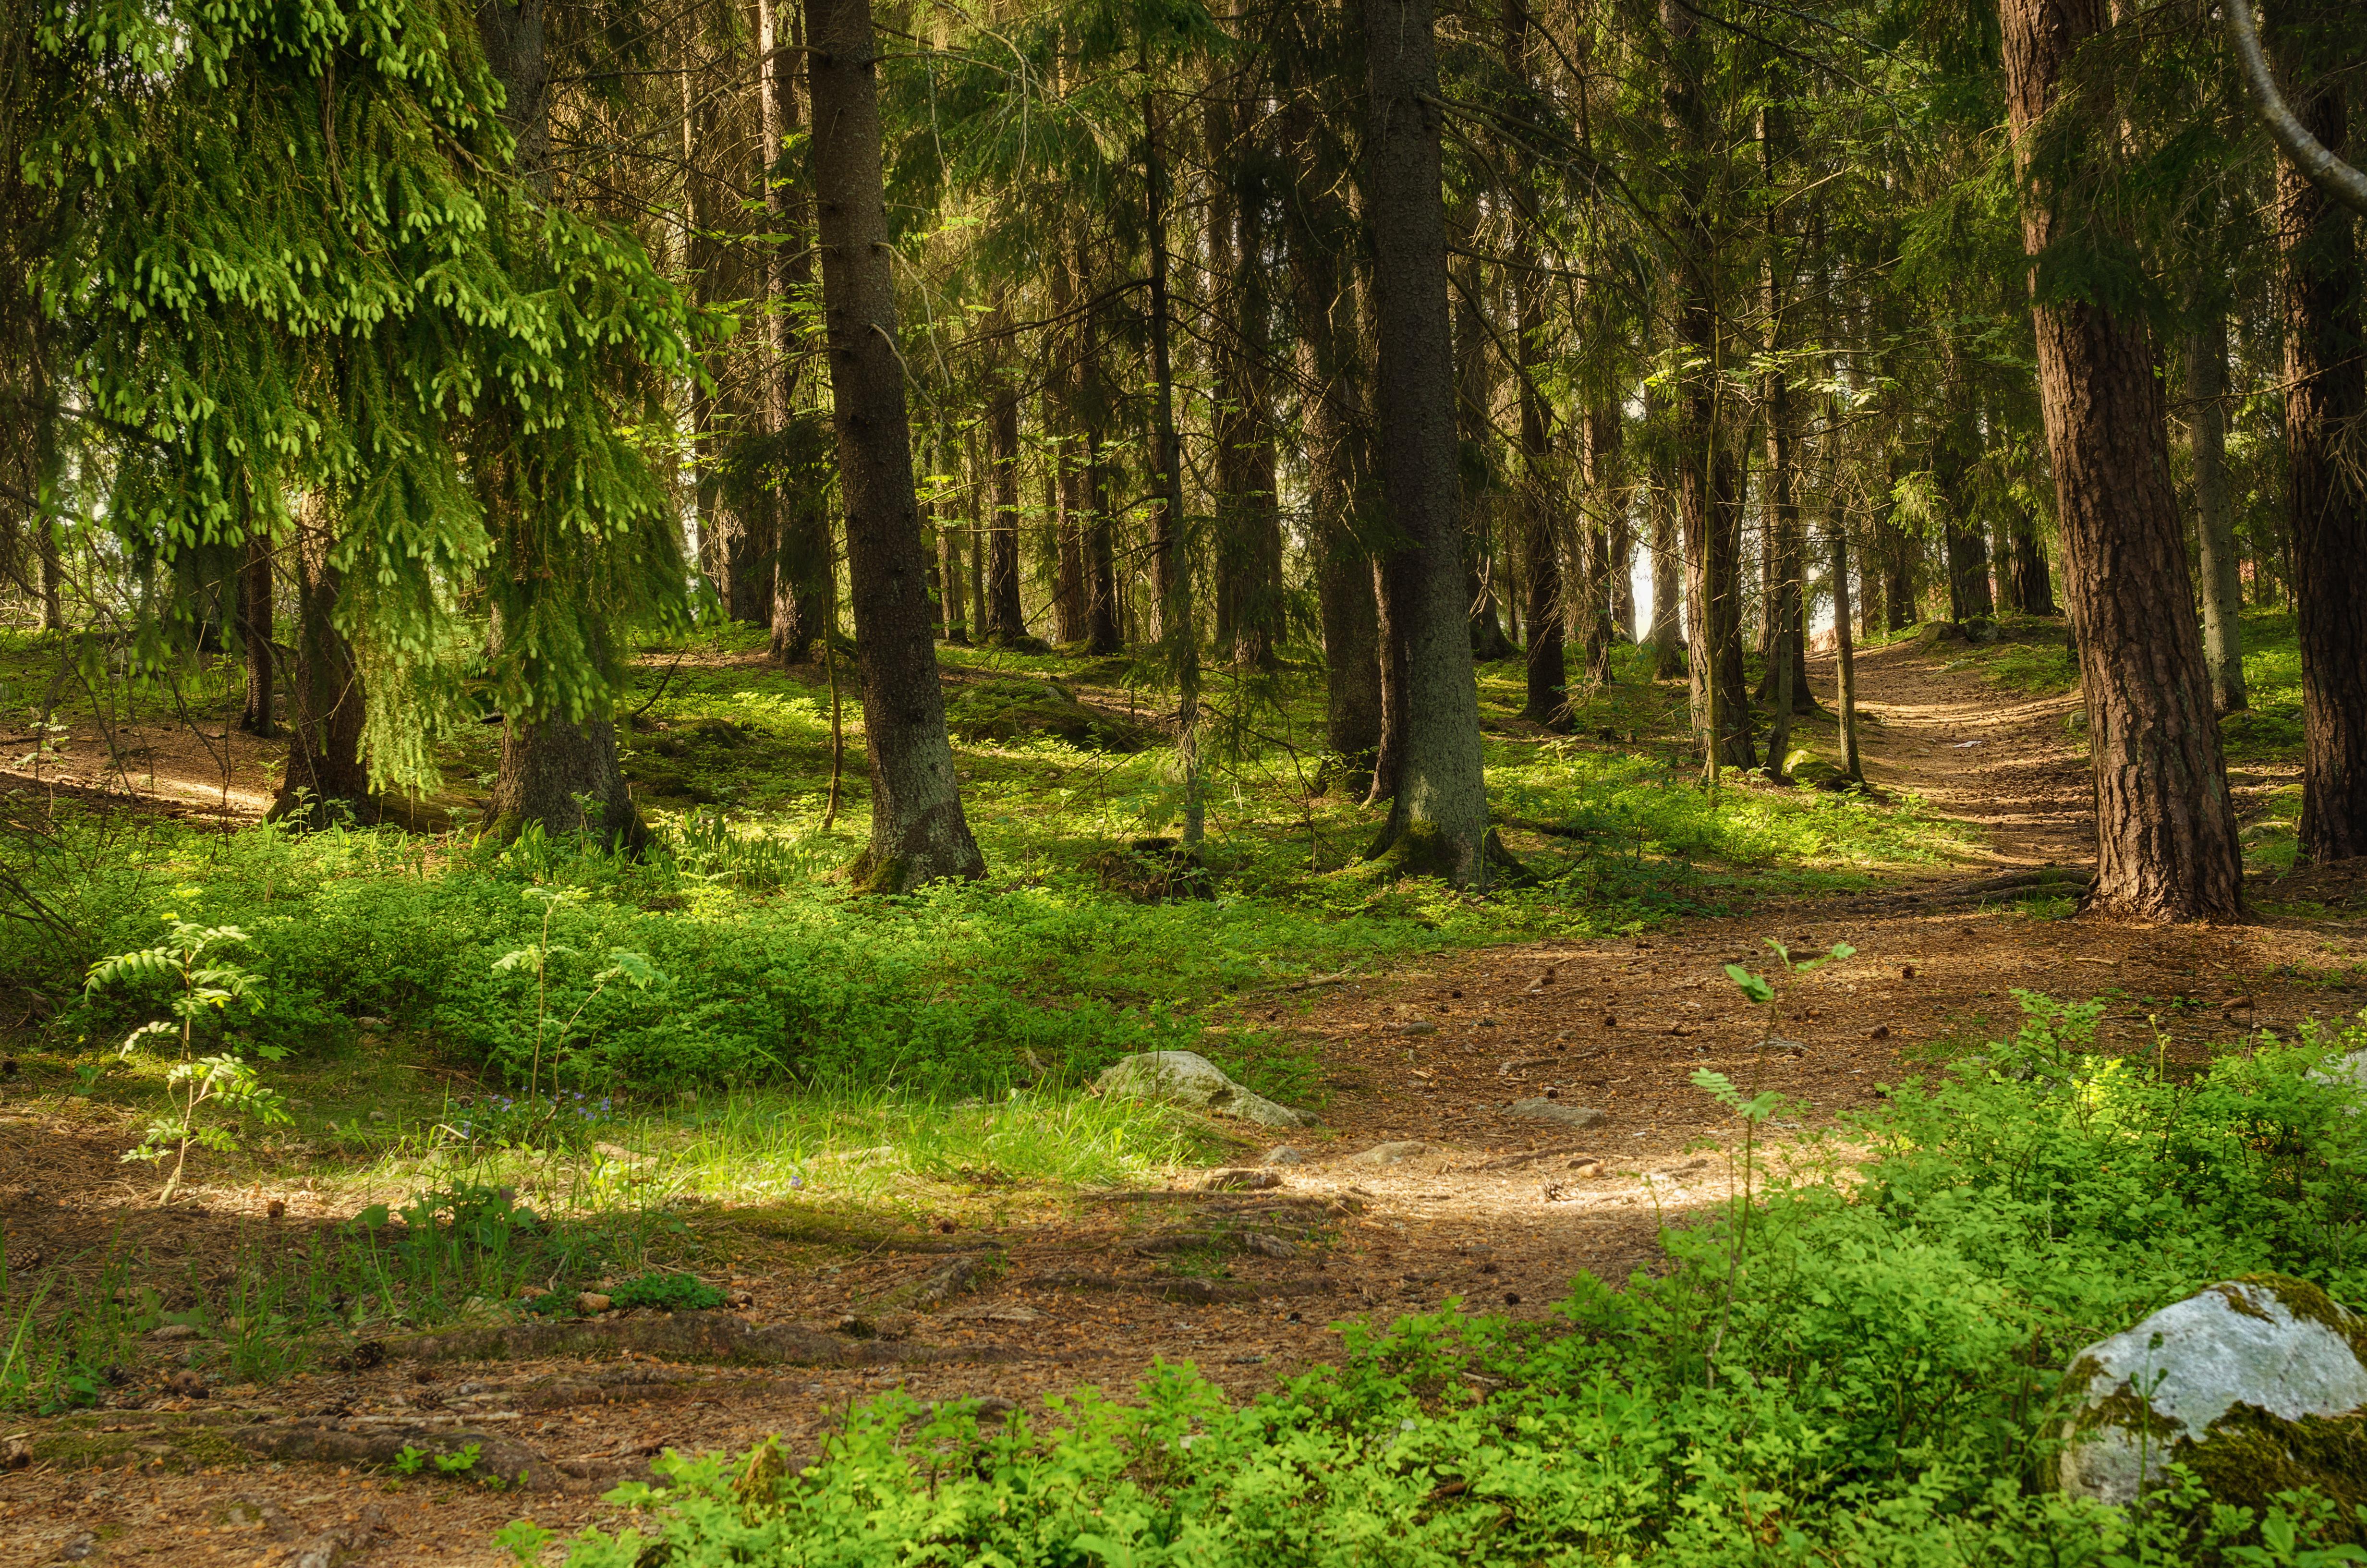 dc2f6e17 Priset på skogsmark når nya höjder - Skog Supply